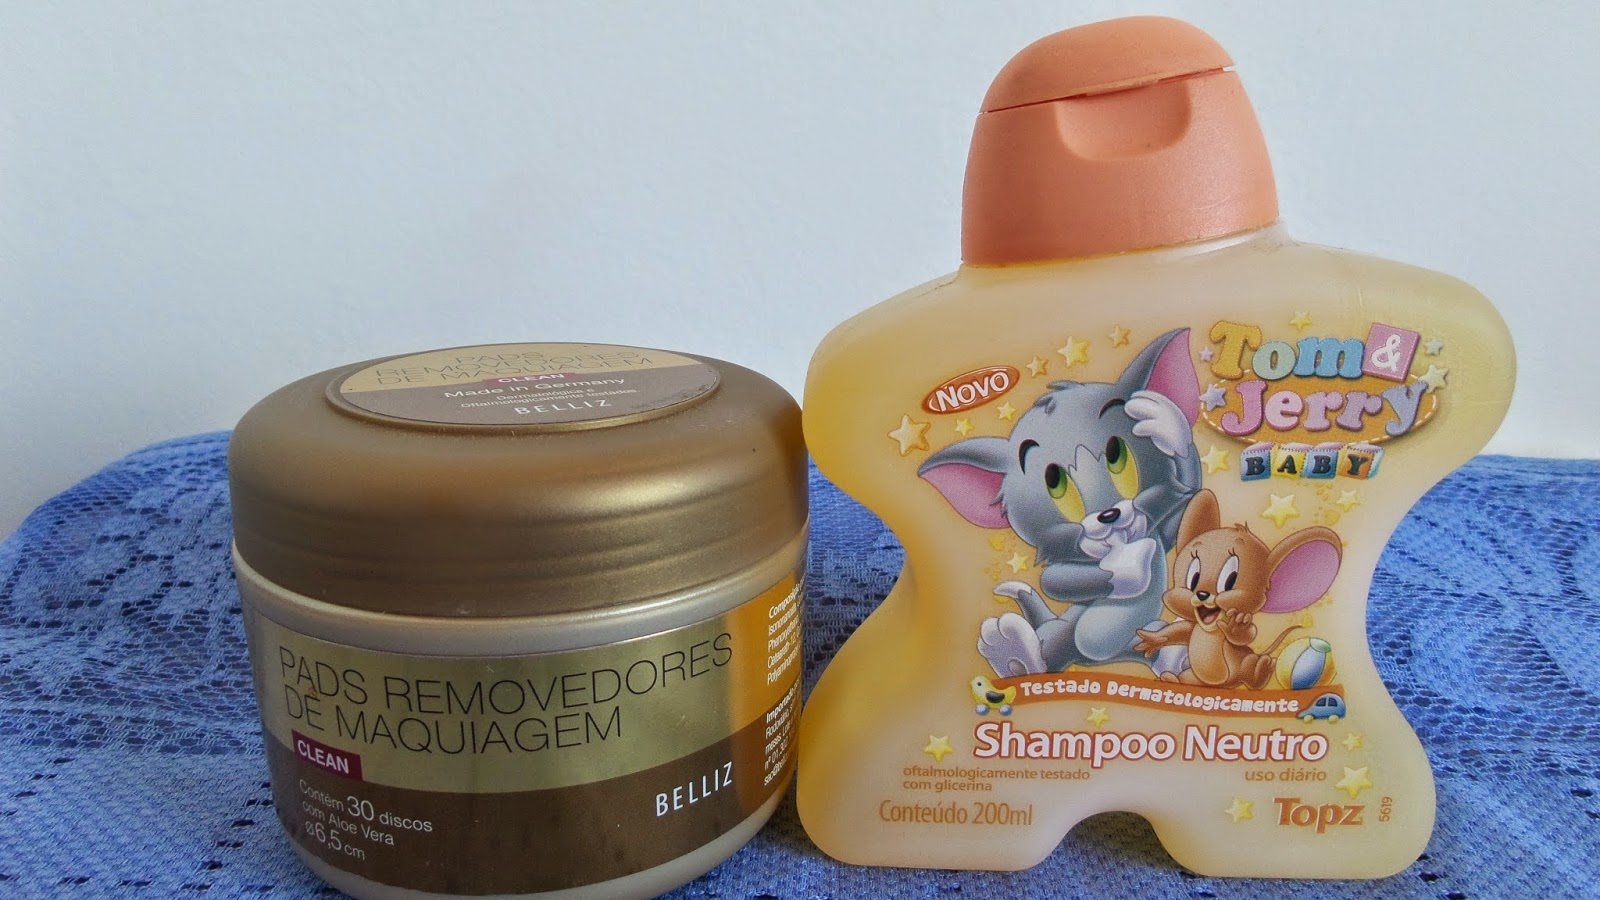 Shampoo Neutro. Tom & Jerry